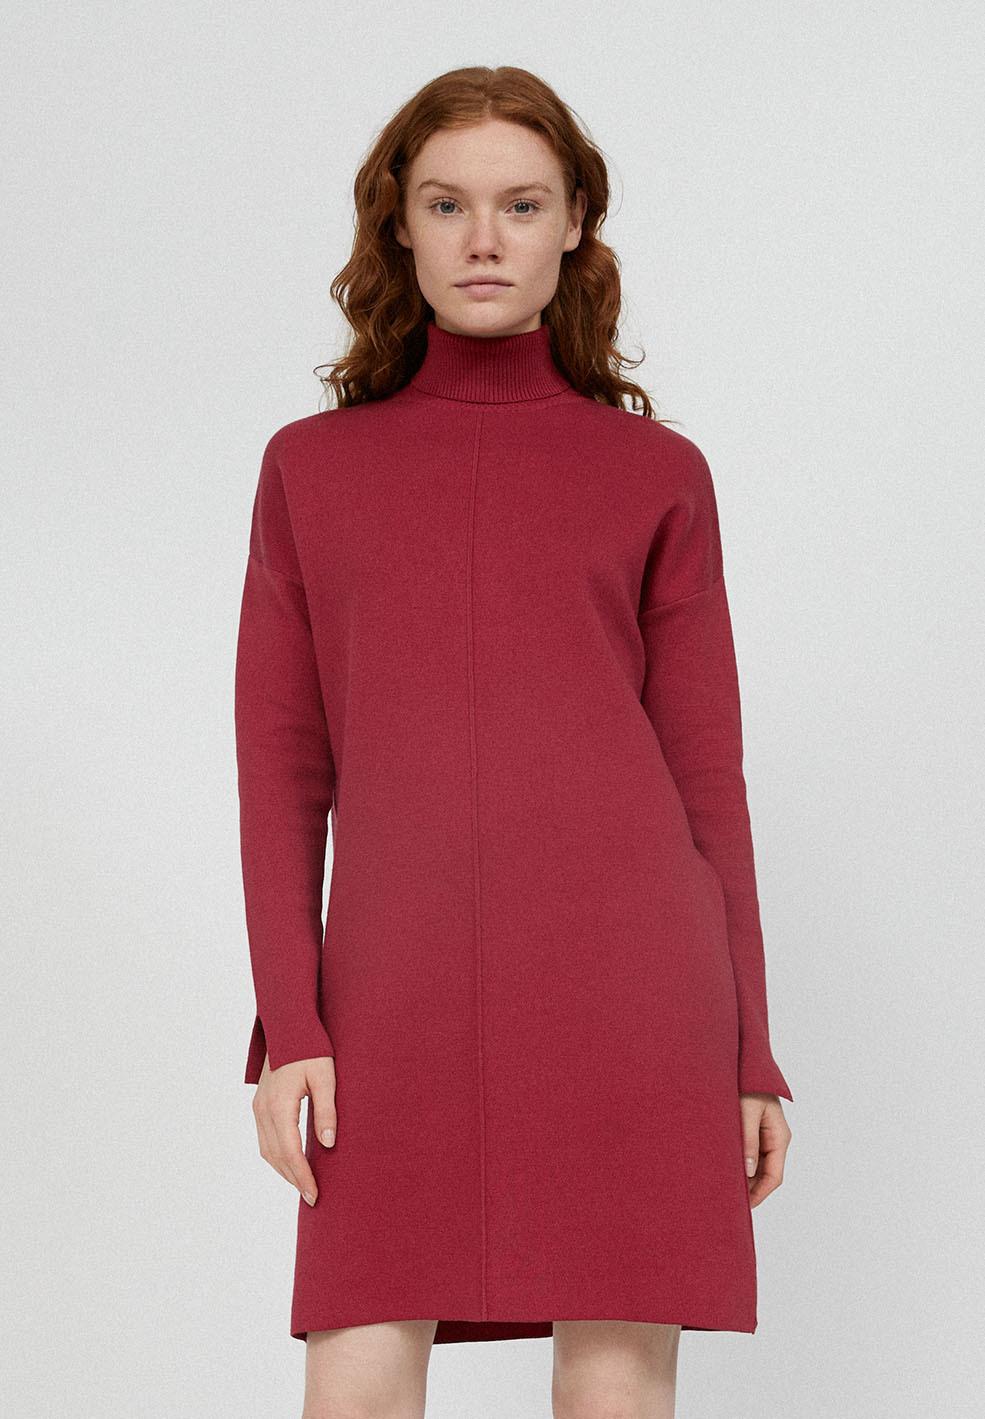 ARMEDANGELS •• SIENNAA  | Dress made of Organic Cotton from De Groene Knoop